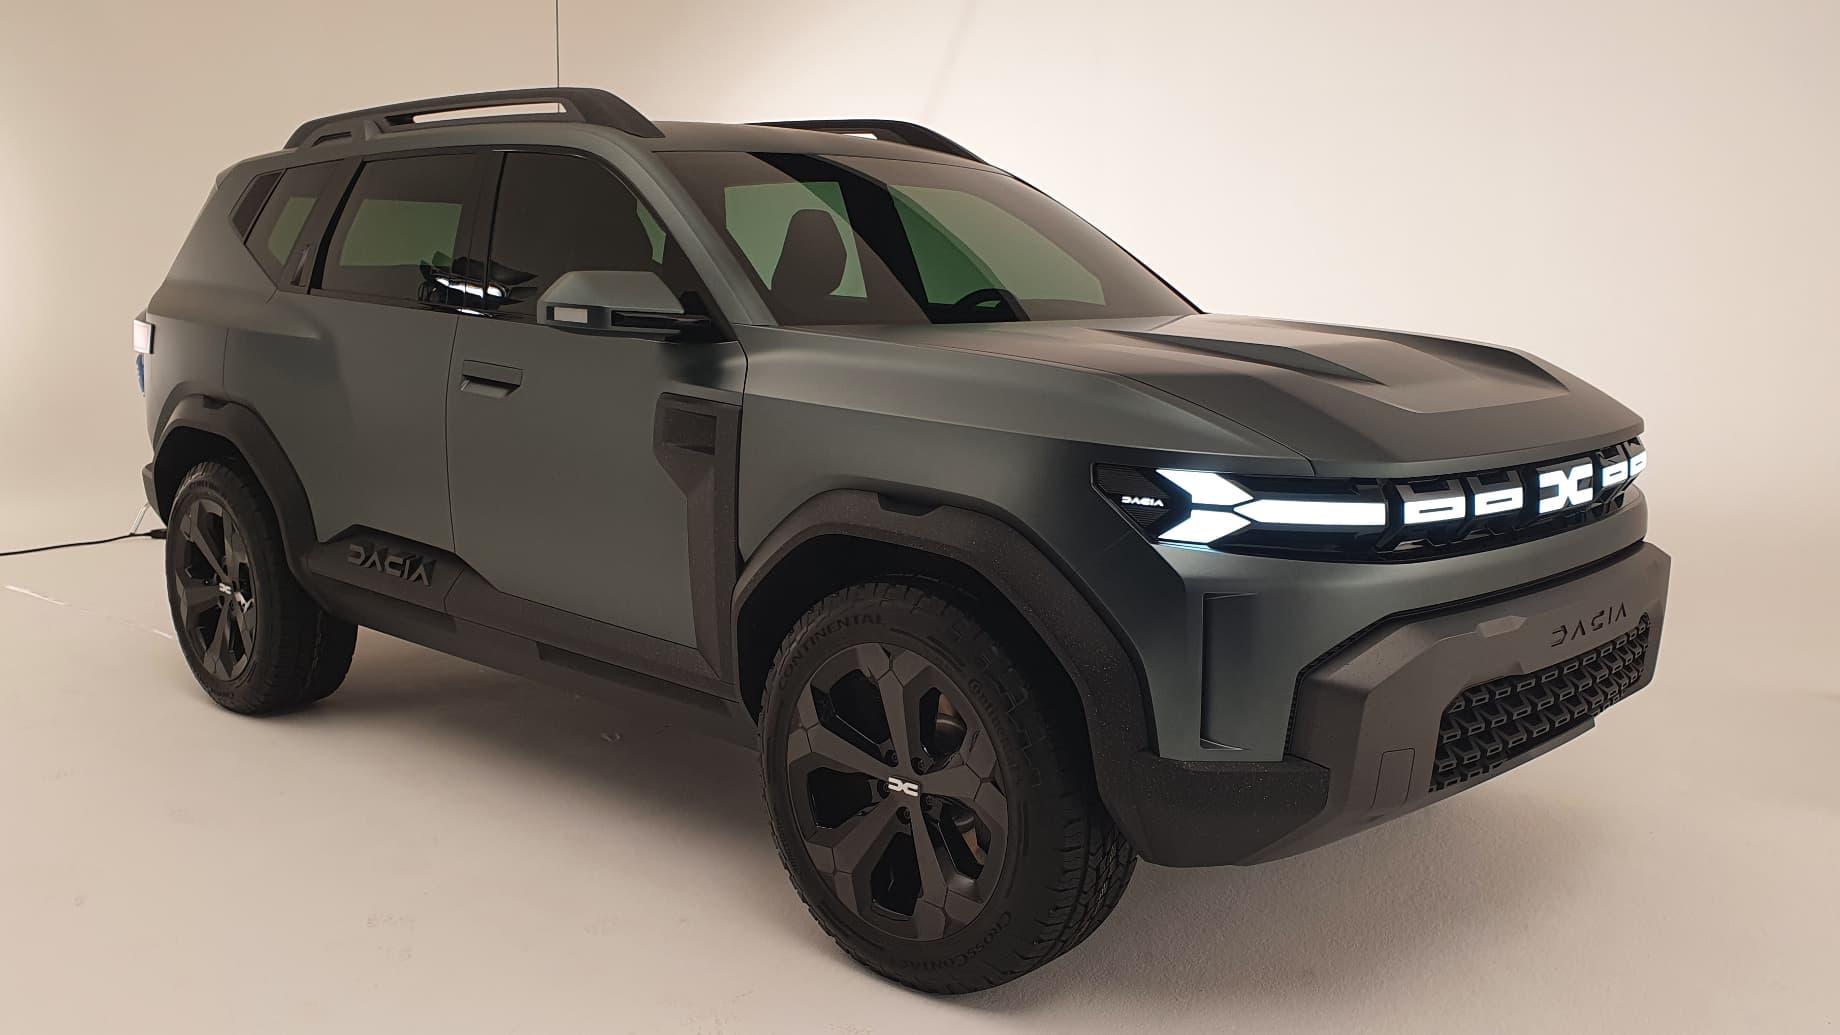 Concept Bigster: le SUV qui veut faire grandir Dacia - BFMTV